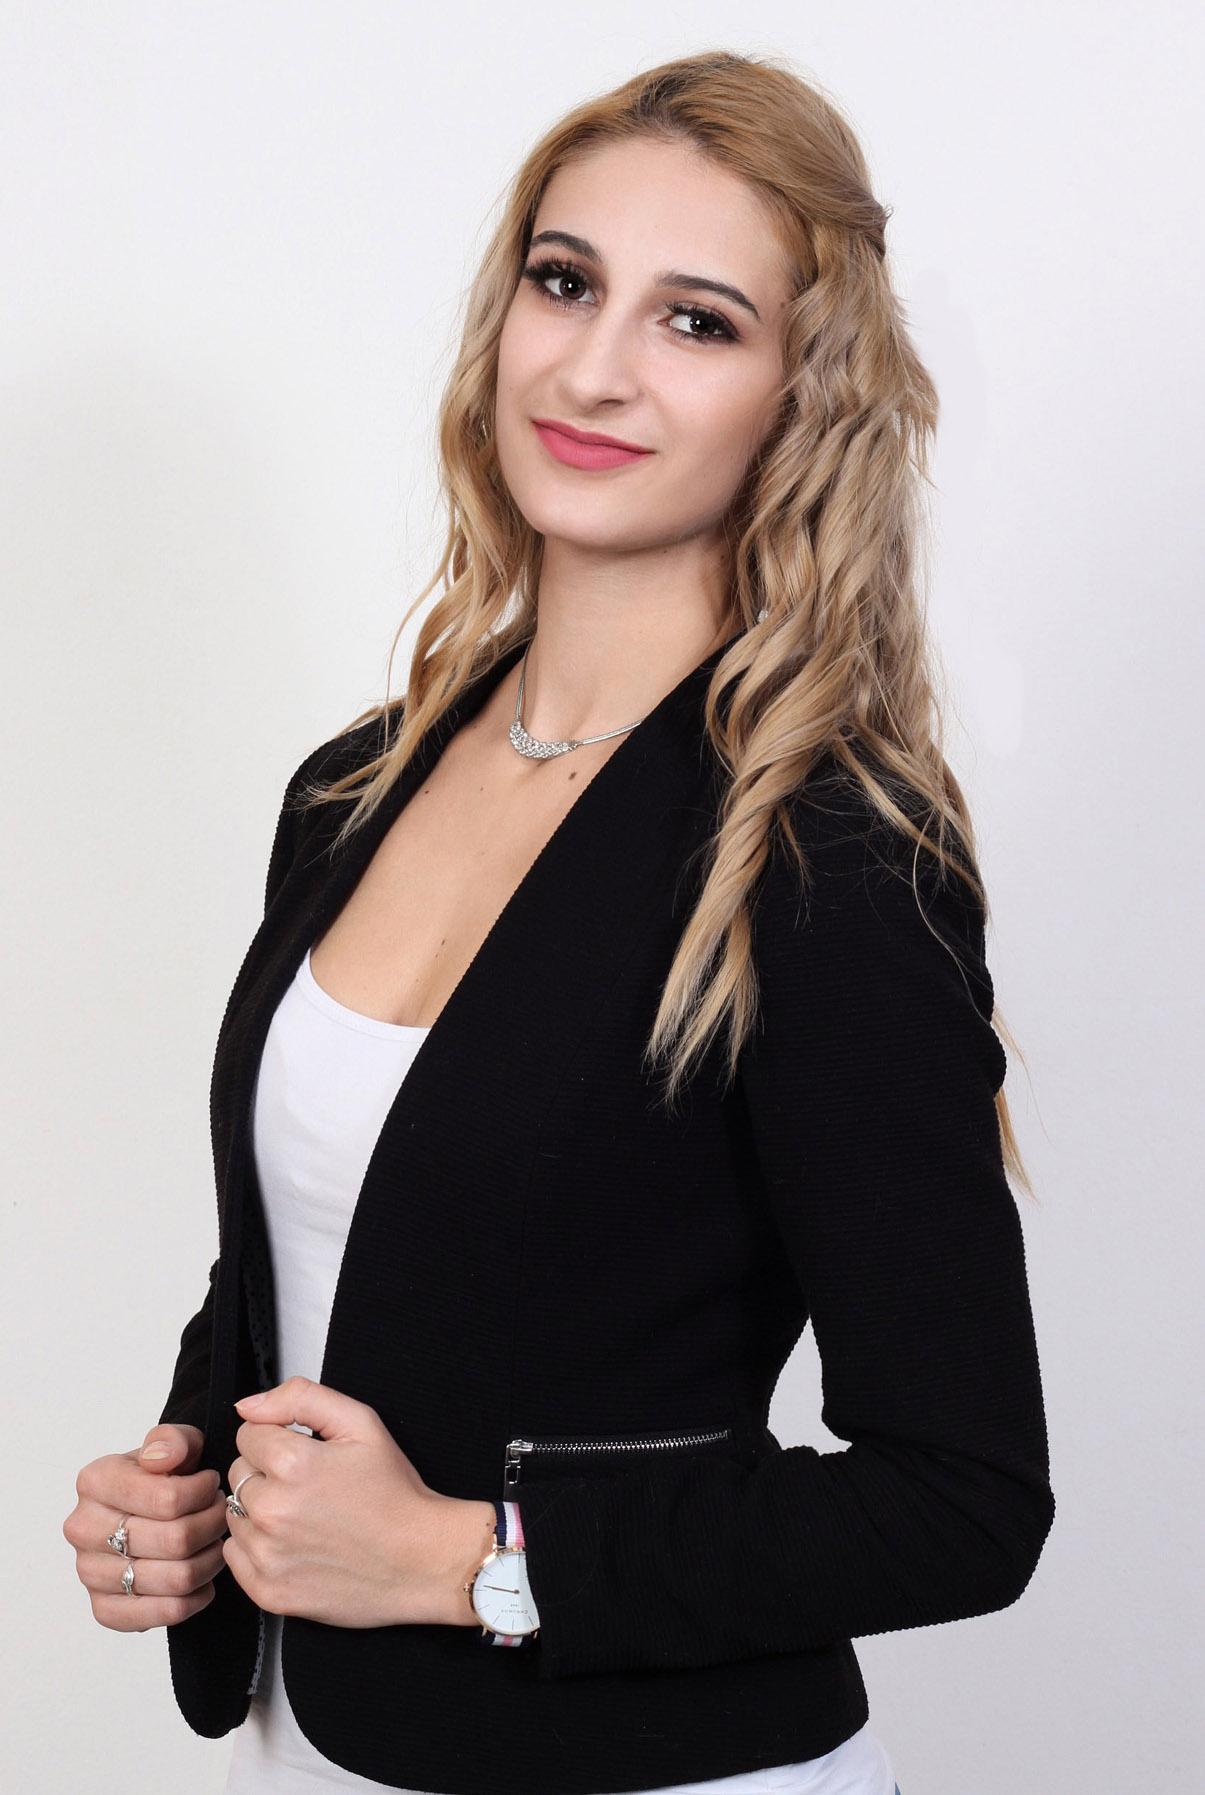 Barbora Galambošová